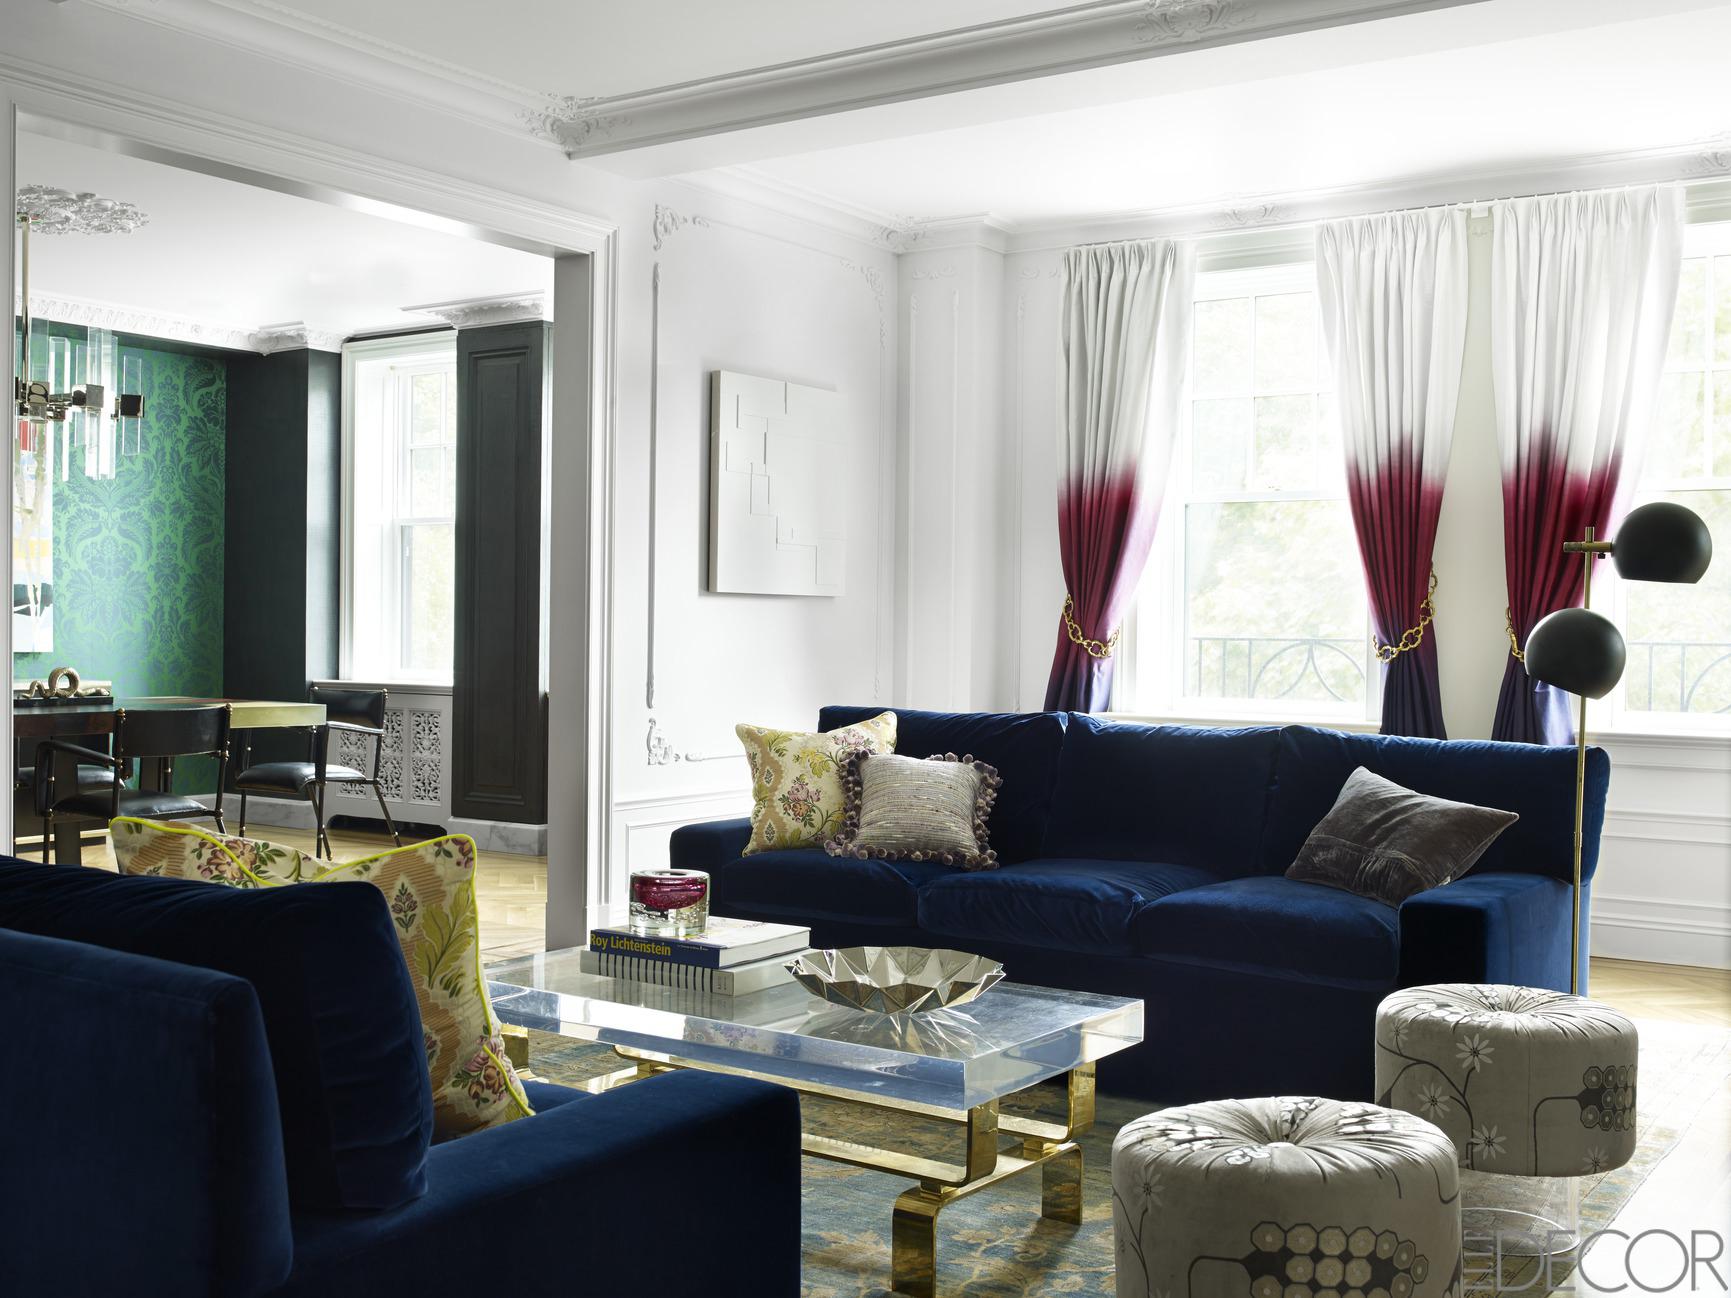 Compact 30 Living Room Curtains Ideas - Window Drapes for Living Rooms curtain design ideas for living room